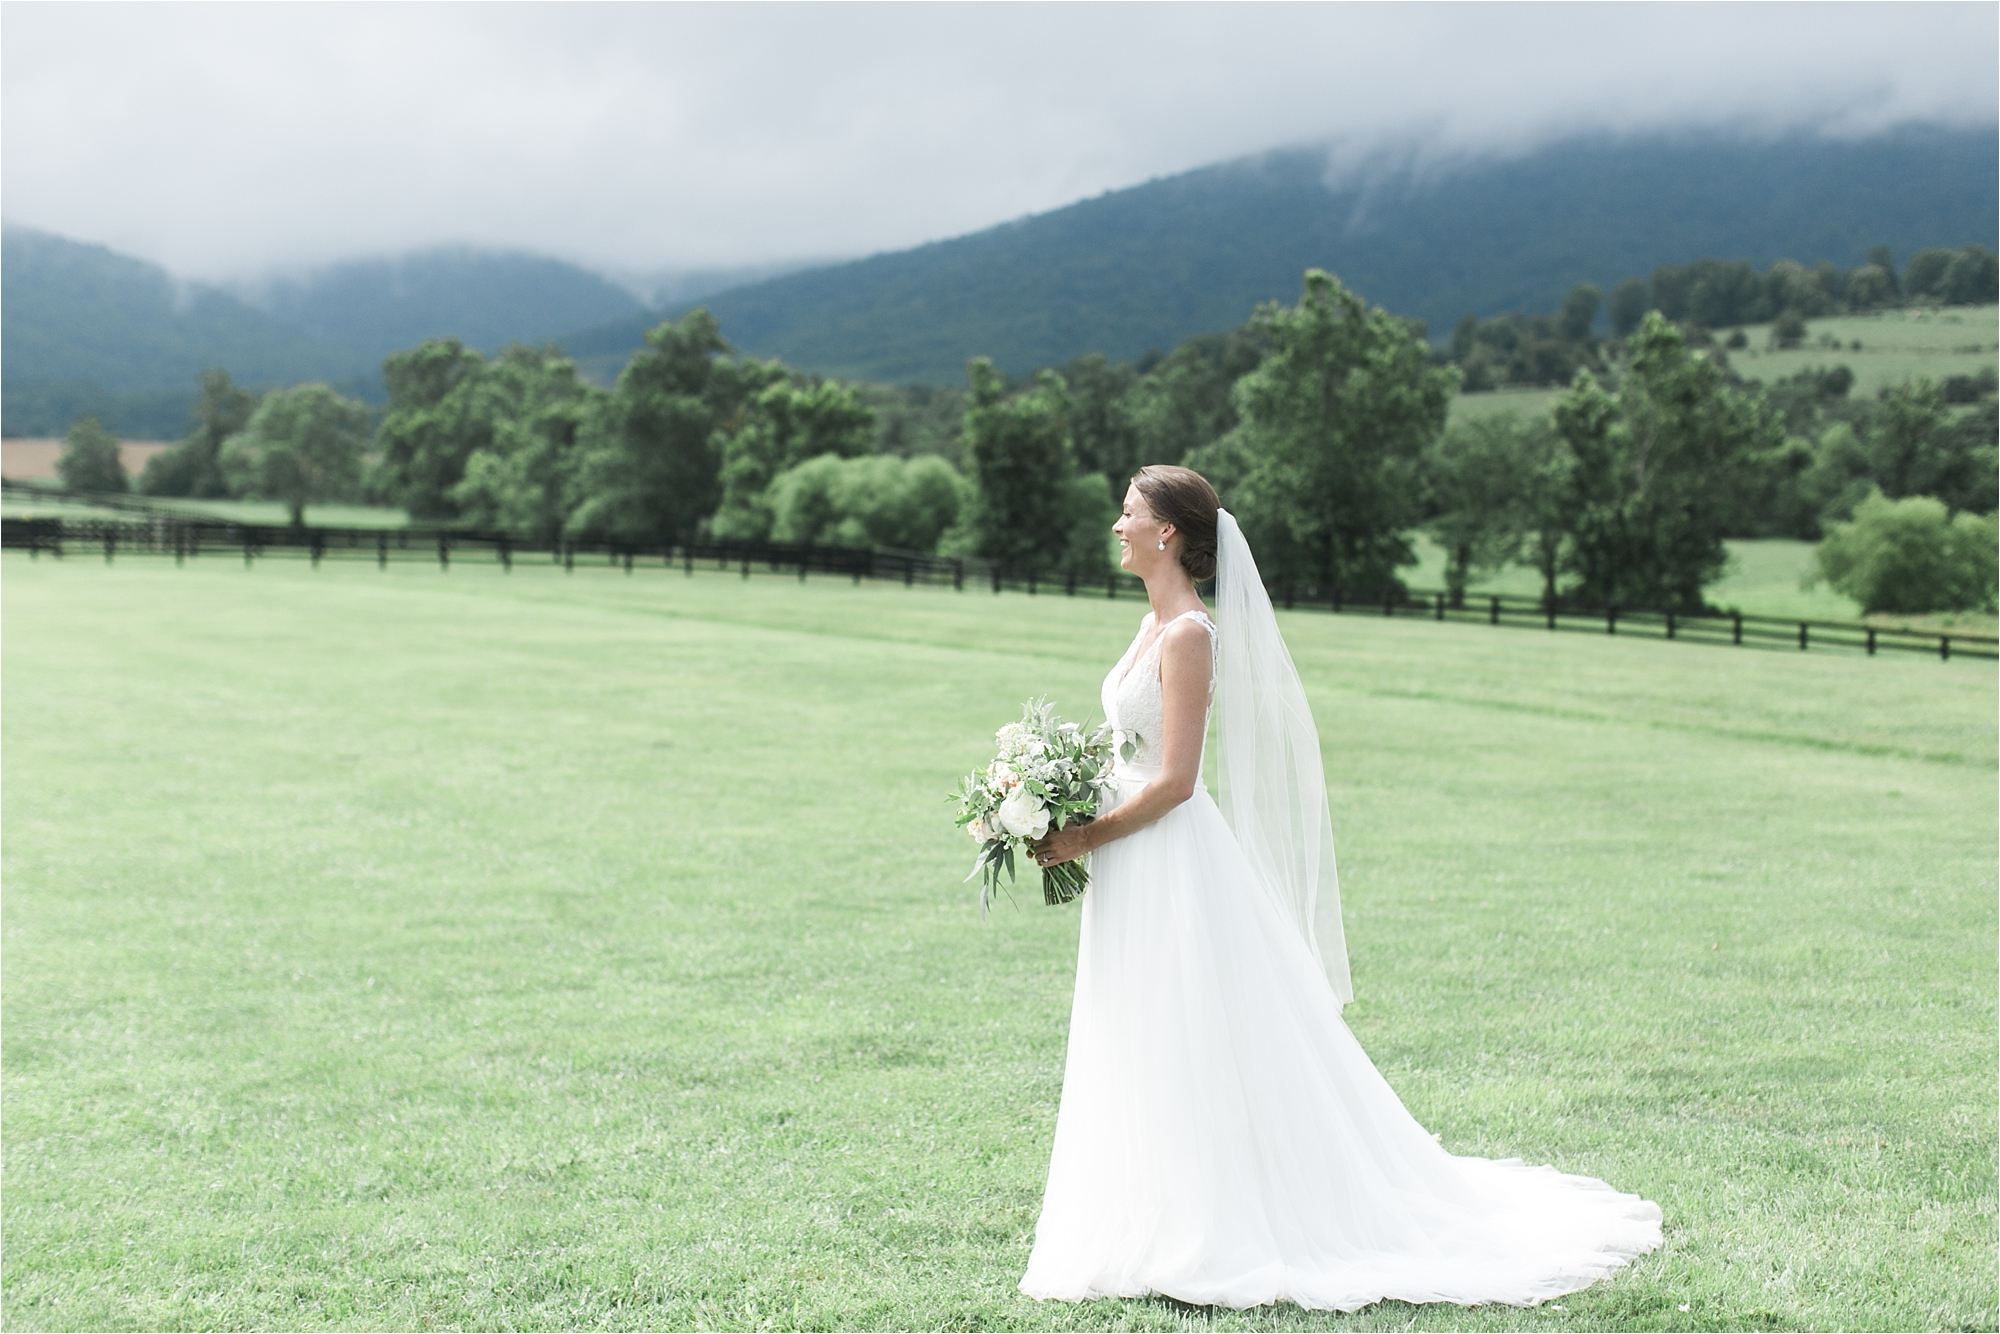 stephanie-yonce-charlottesville-virginia-king-family-vineyard-wedding-photos_0019.jpg